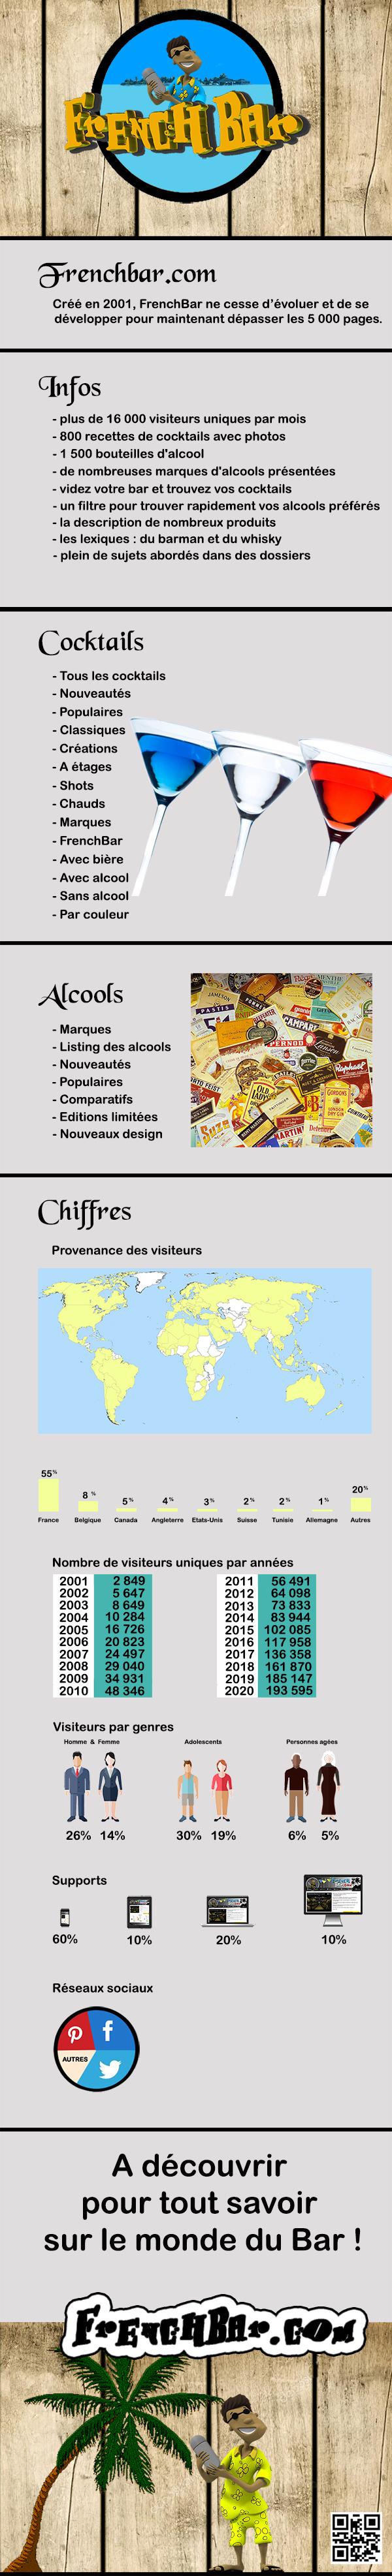 FrenchBar's Infographic 2001-2020